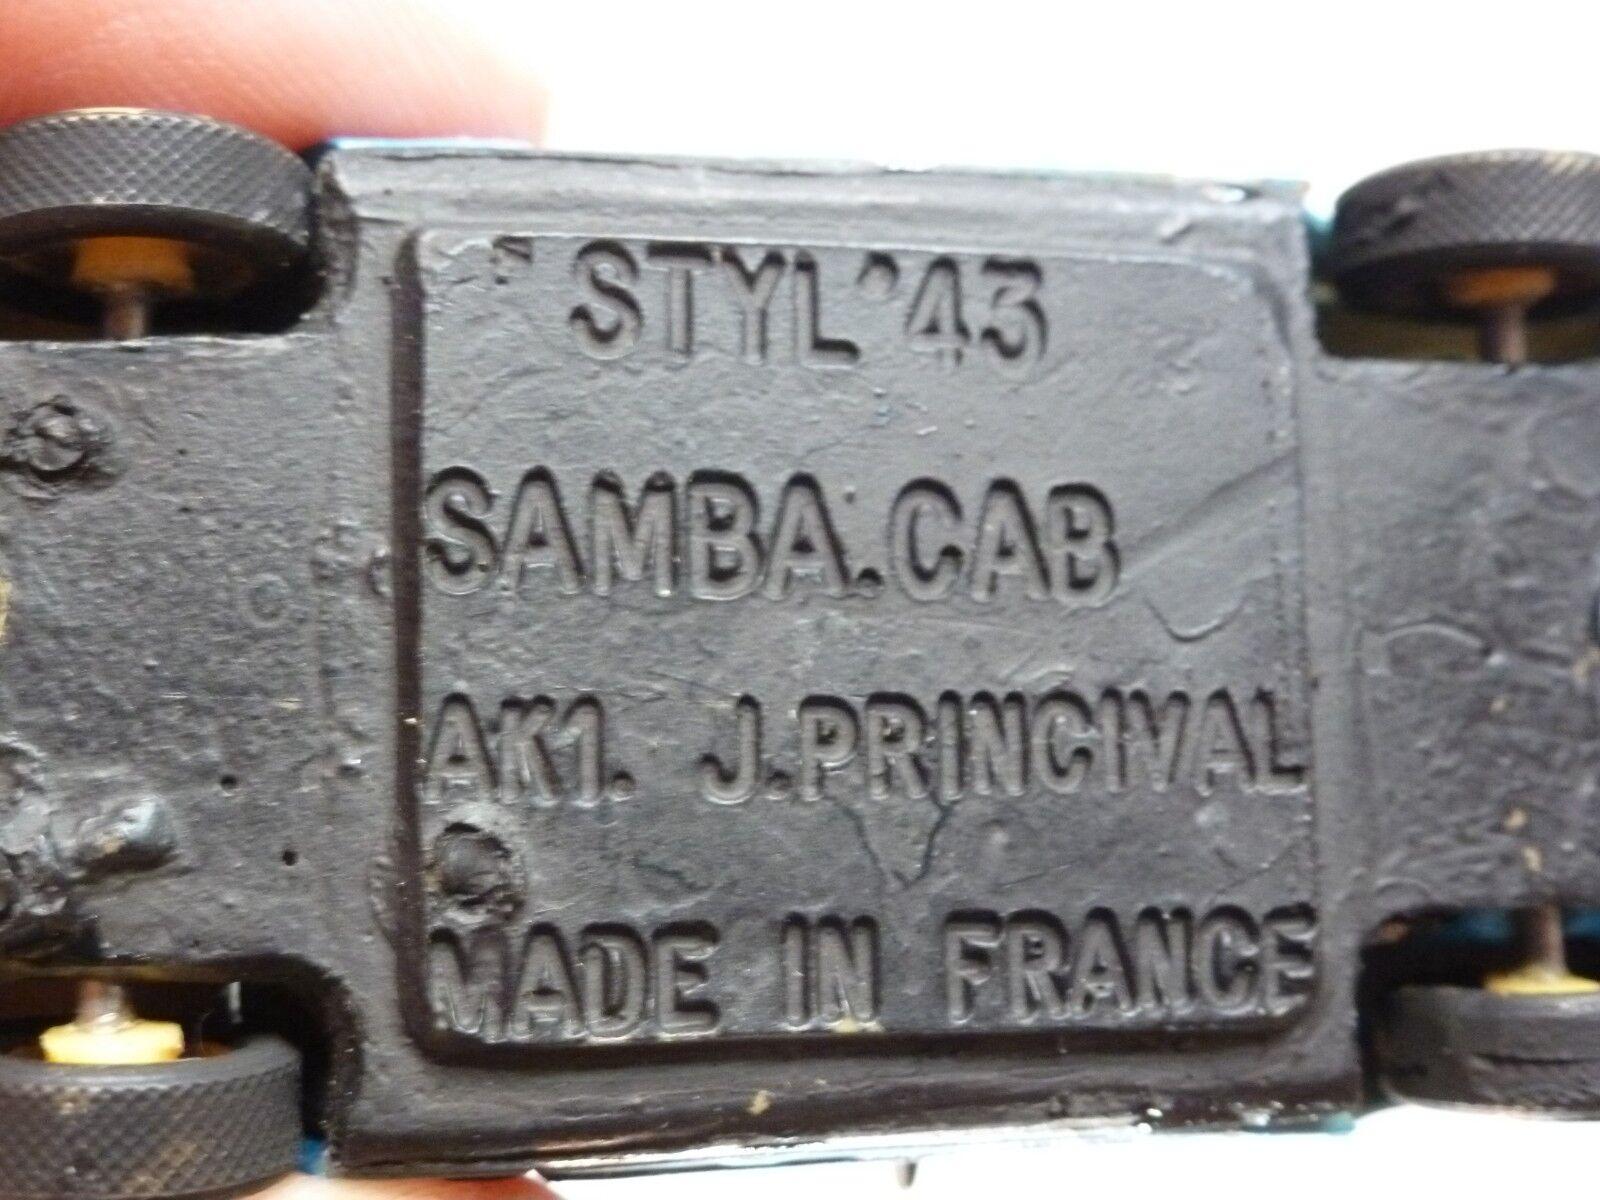 STYL STYL STYL 43 TALBOT SAMBA CABRIO - blueE 1 43 - EXCELLENT - 3 da72d7